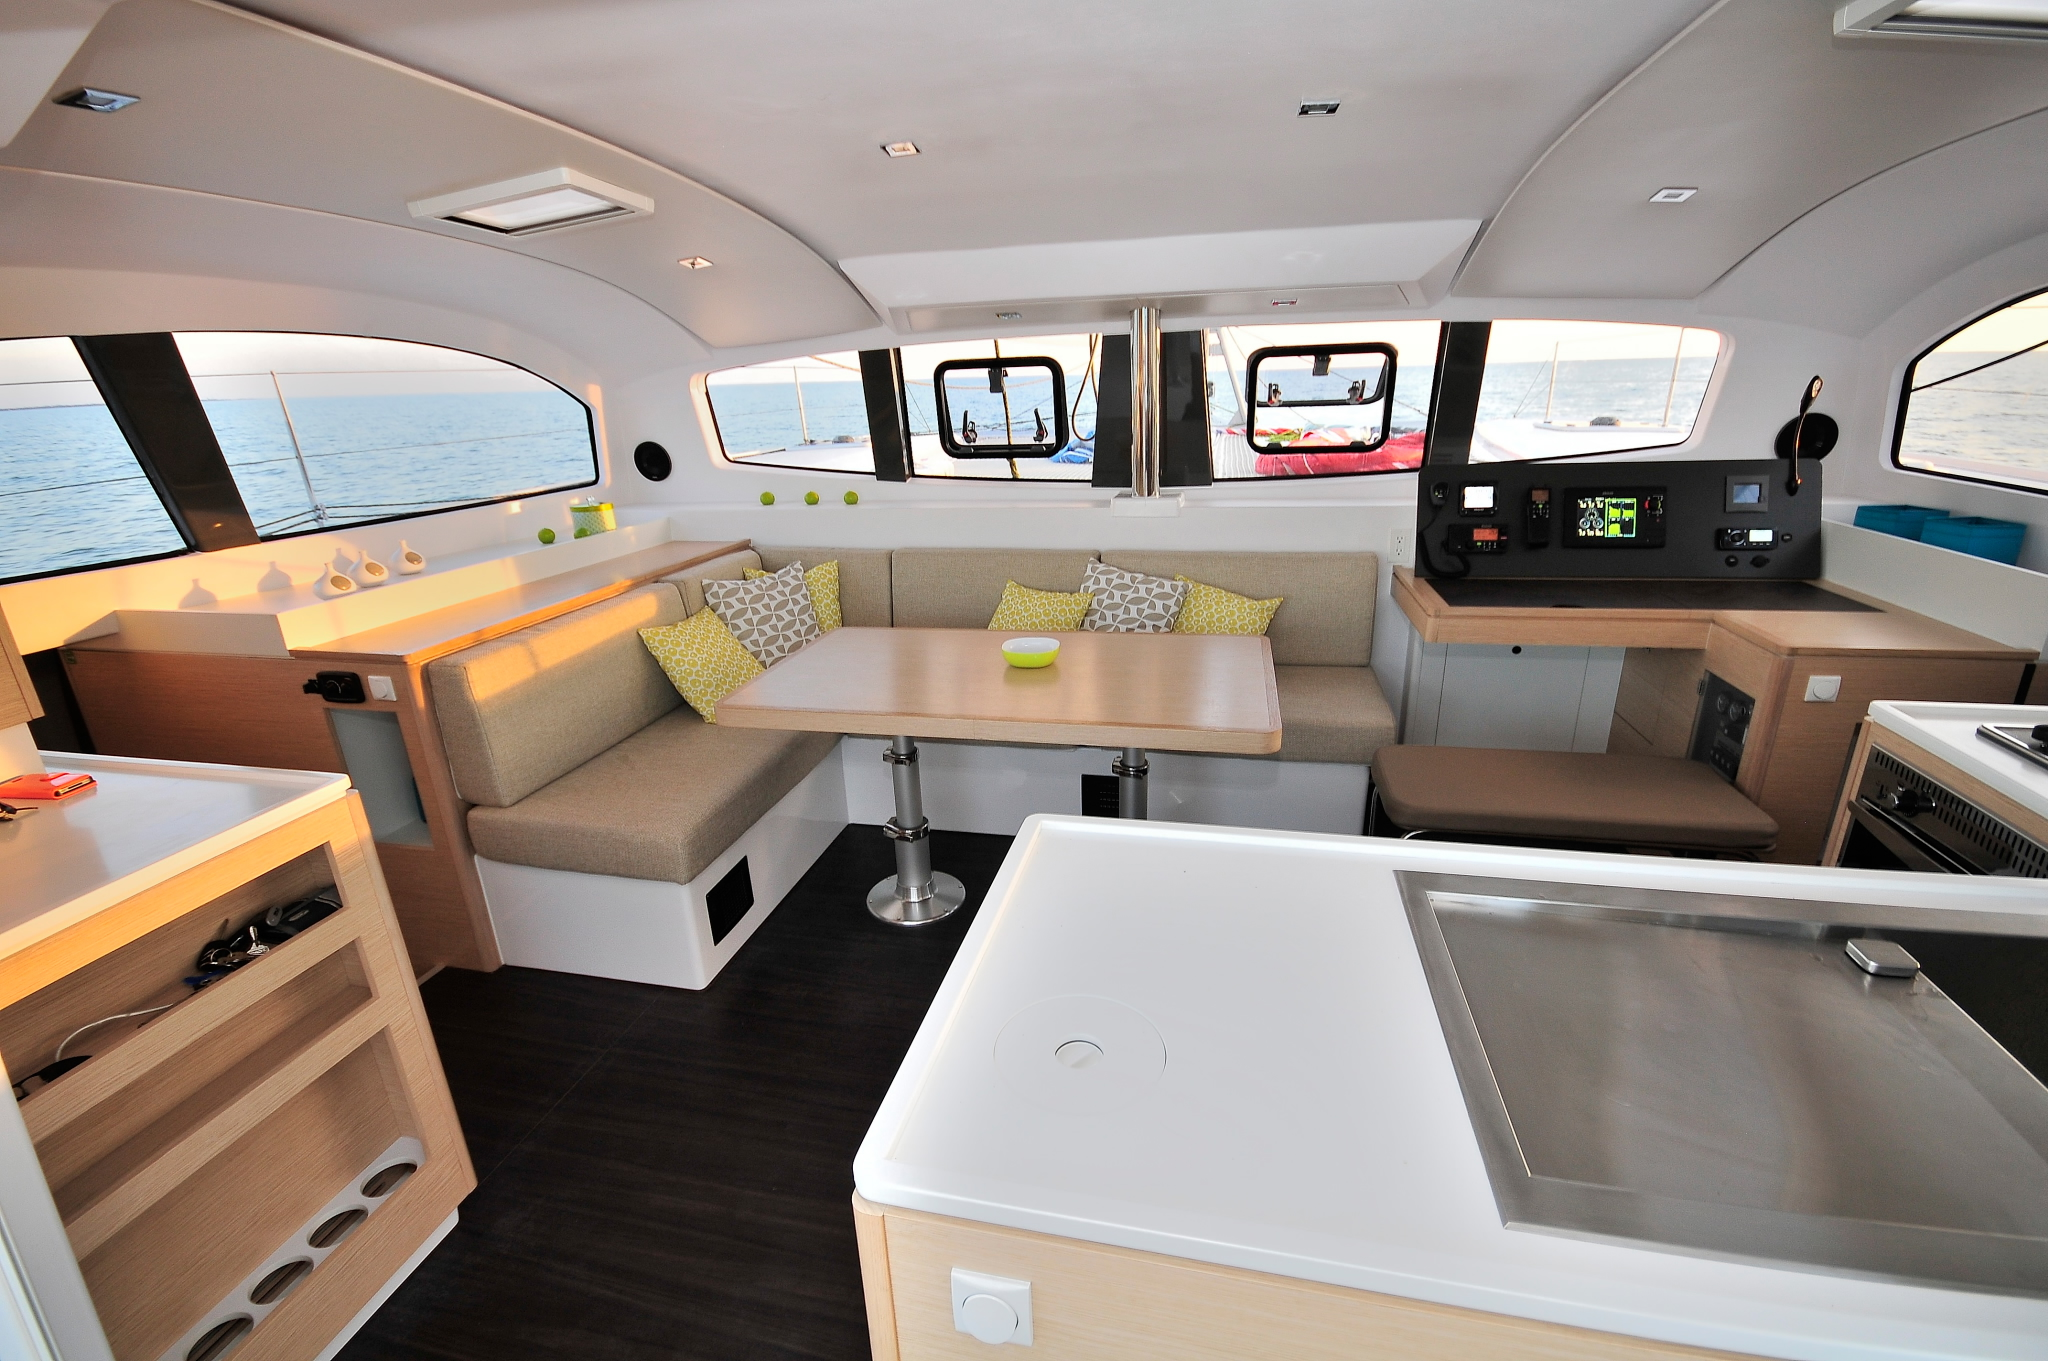 Outremer 45 catamaran interior 1 saloon.jpg